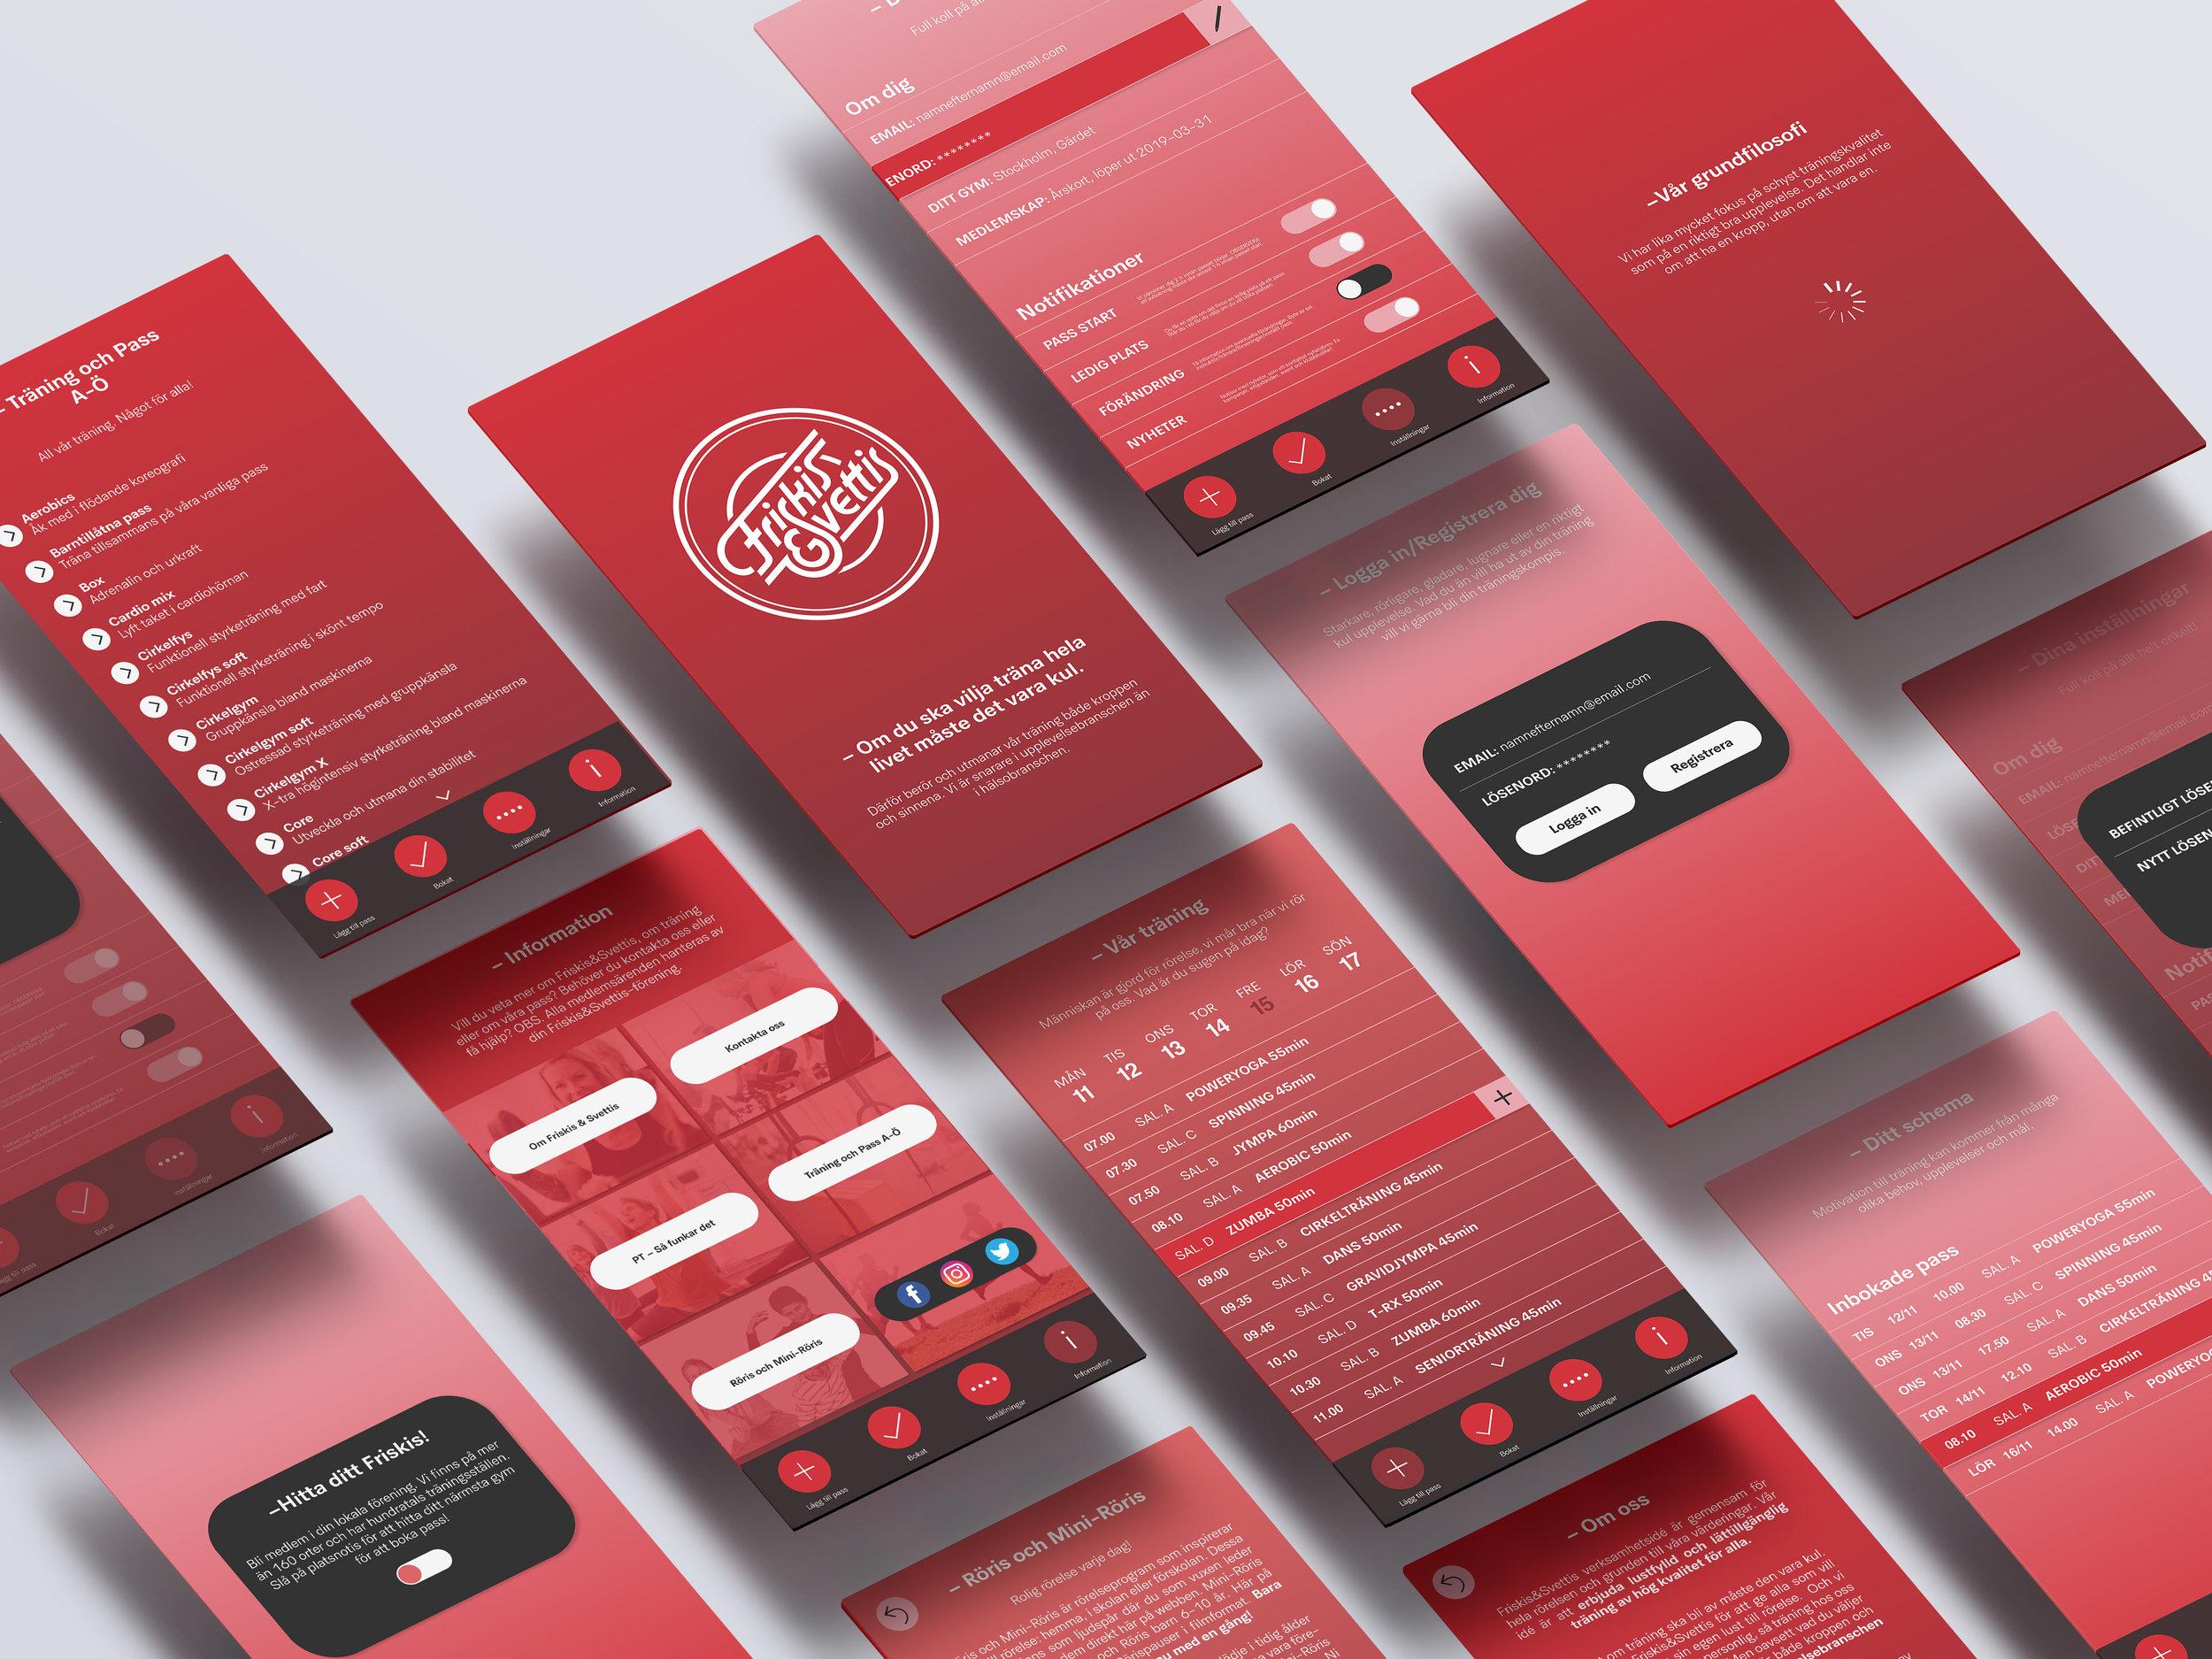 3.Friskis&Svettis_App_Design_(C)LISALILJENBERG